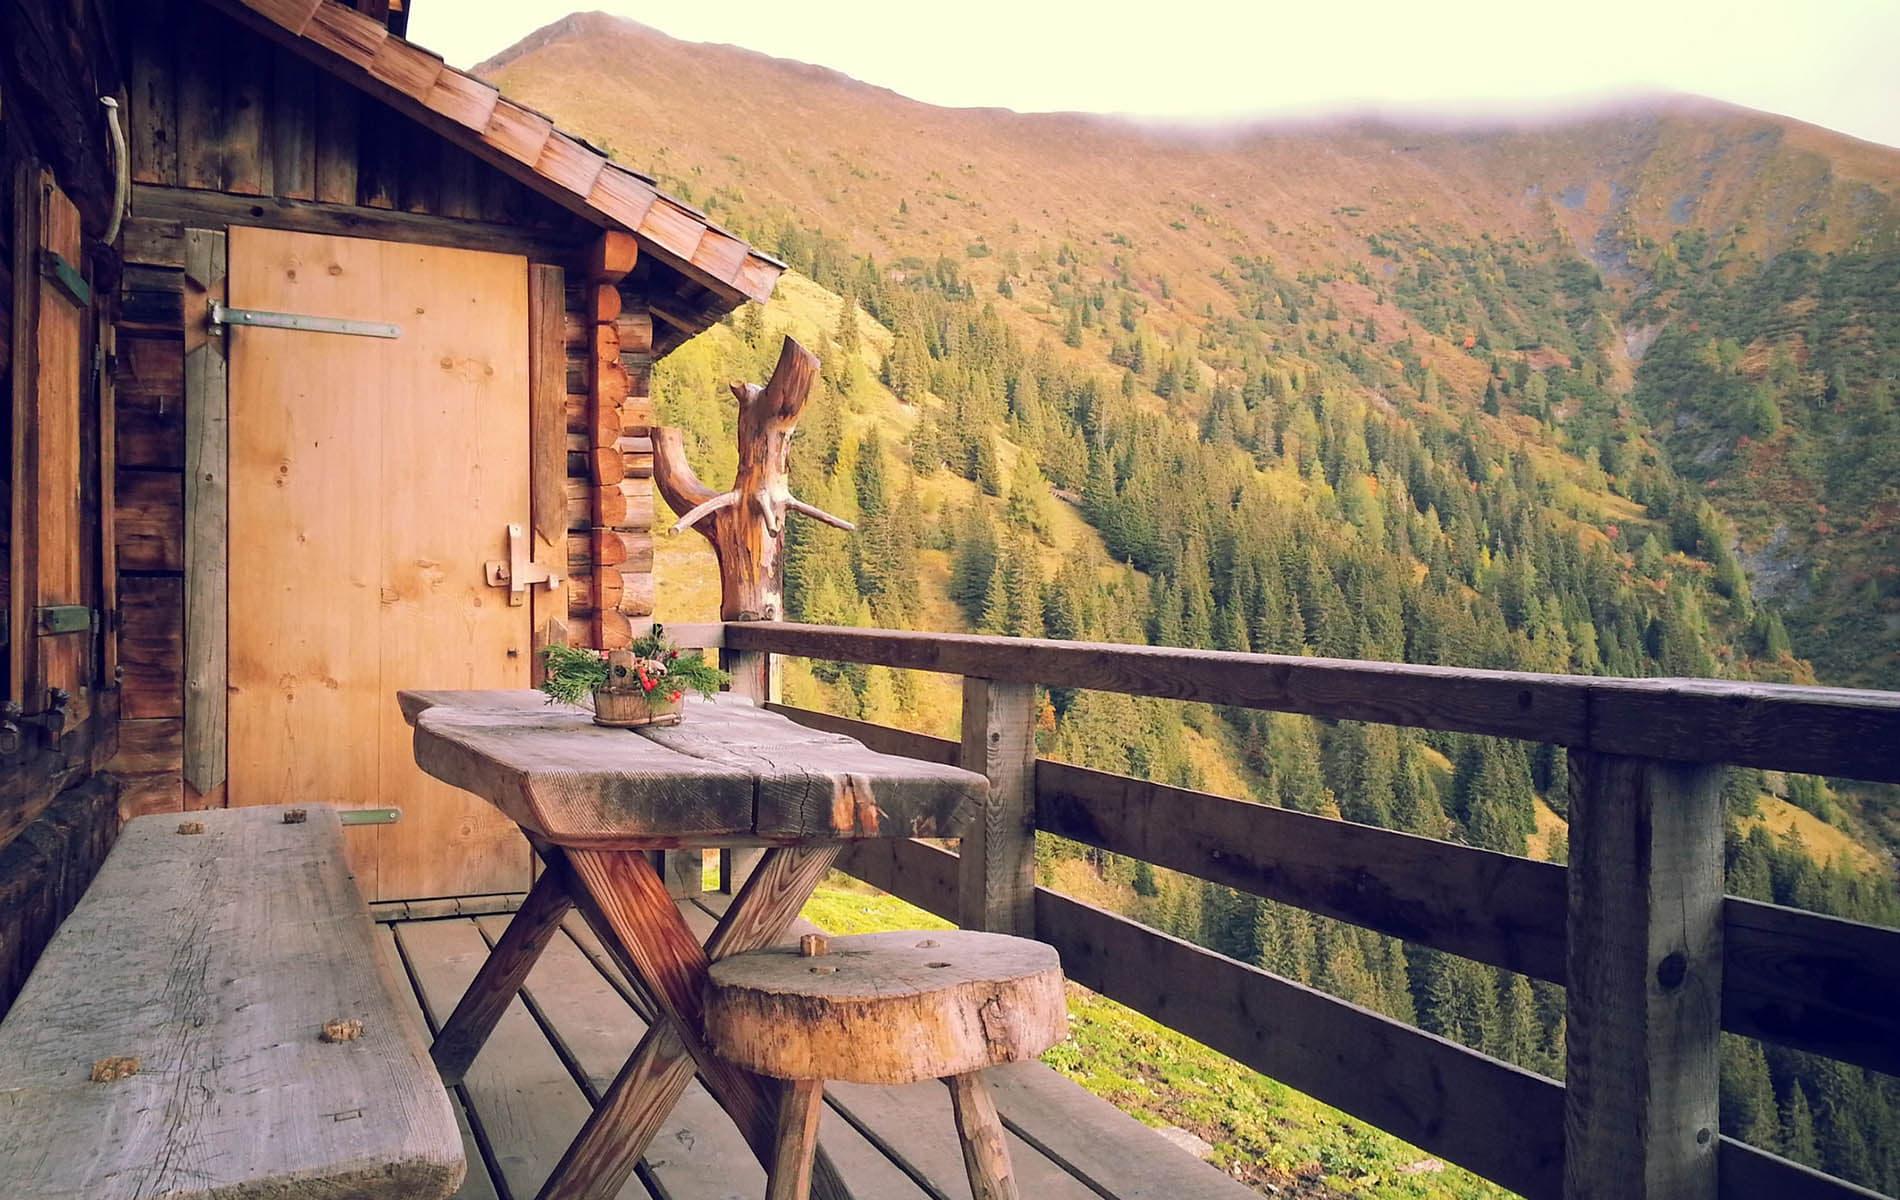 Awesome Markisen Fur Balkon Design Ideen Pictures - Design & Ideas ...